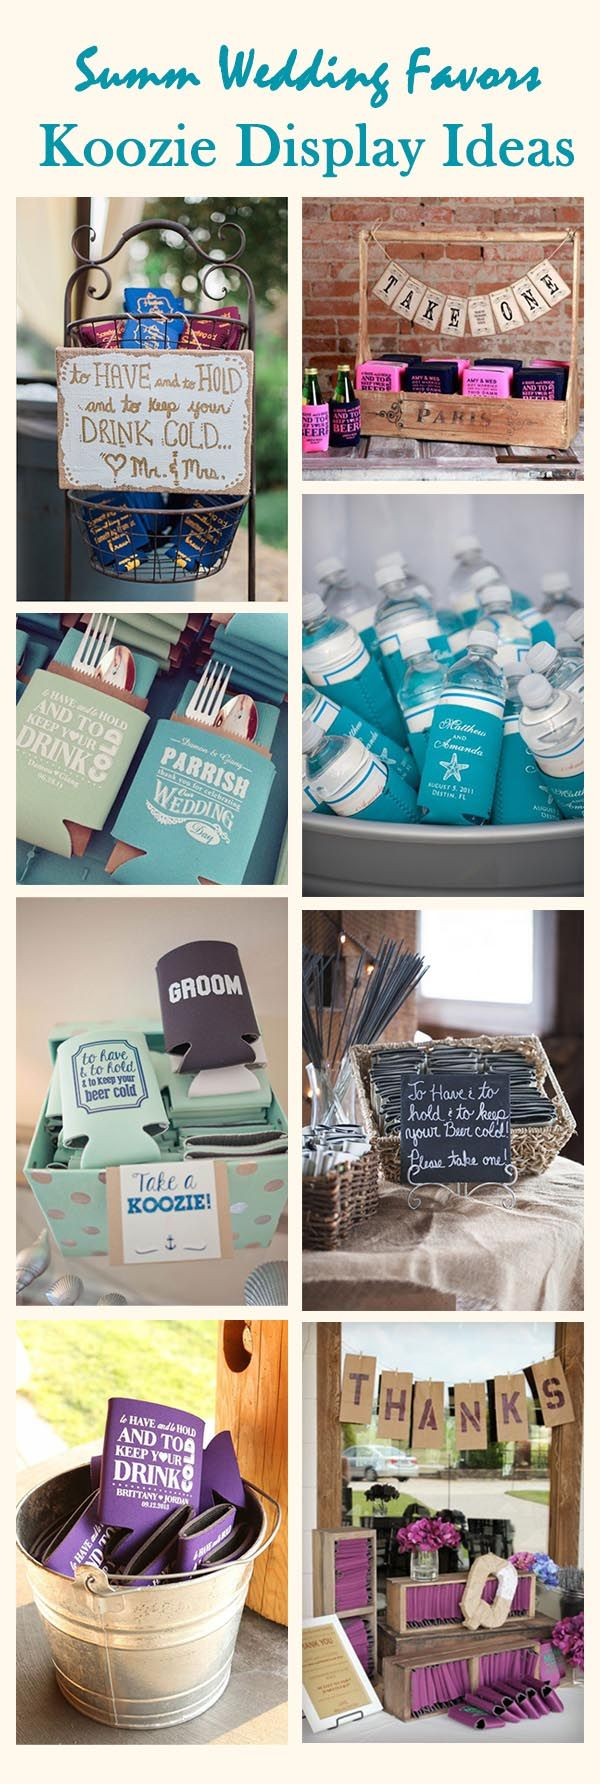 8 best Koozie ideas images on Pinterest | Wedding stuff, Knot and ...